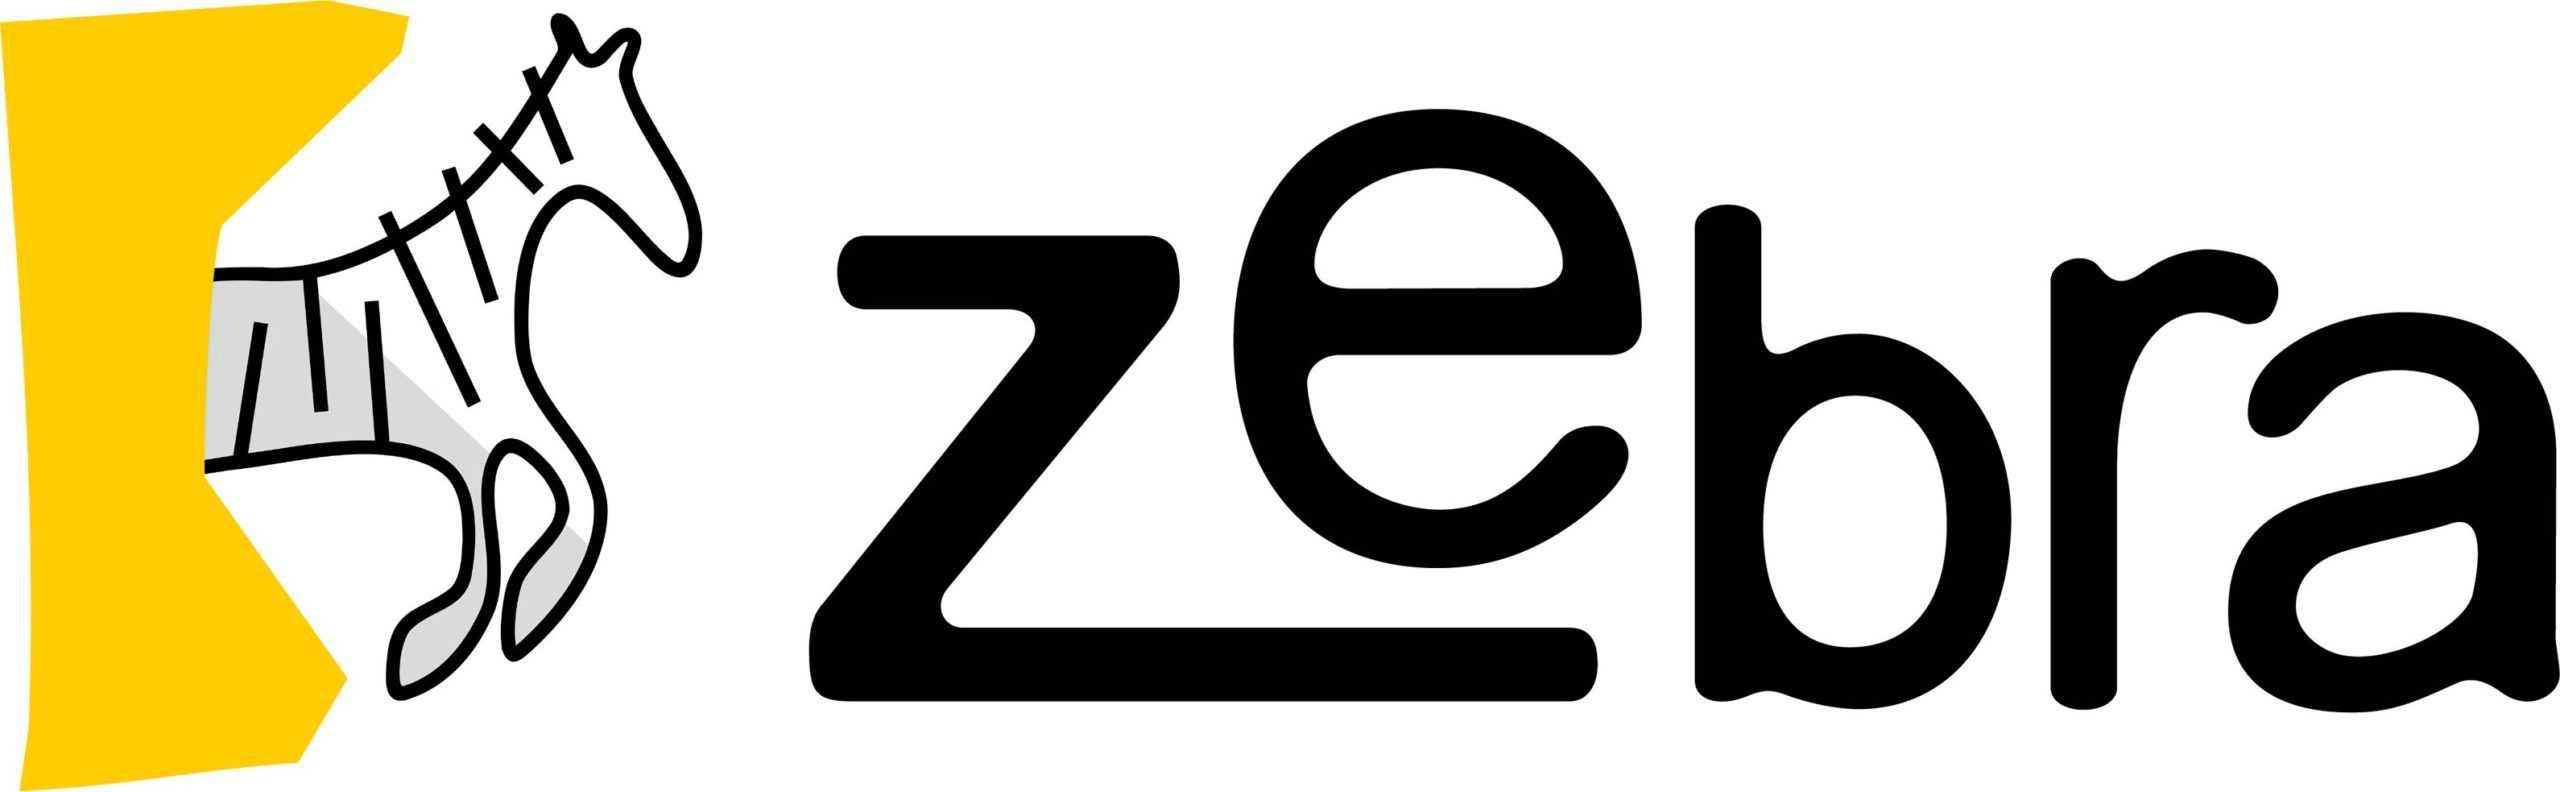 ZEBRA - Interkulturelles Beratungs- und Therapiezentrum